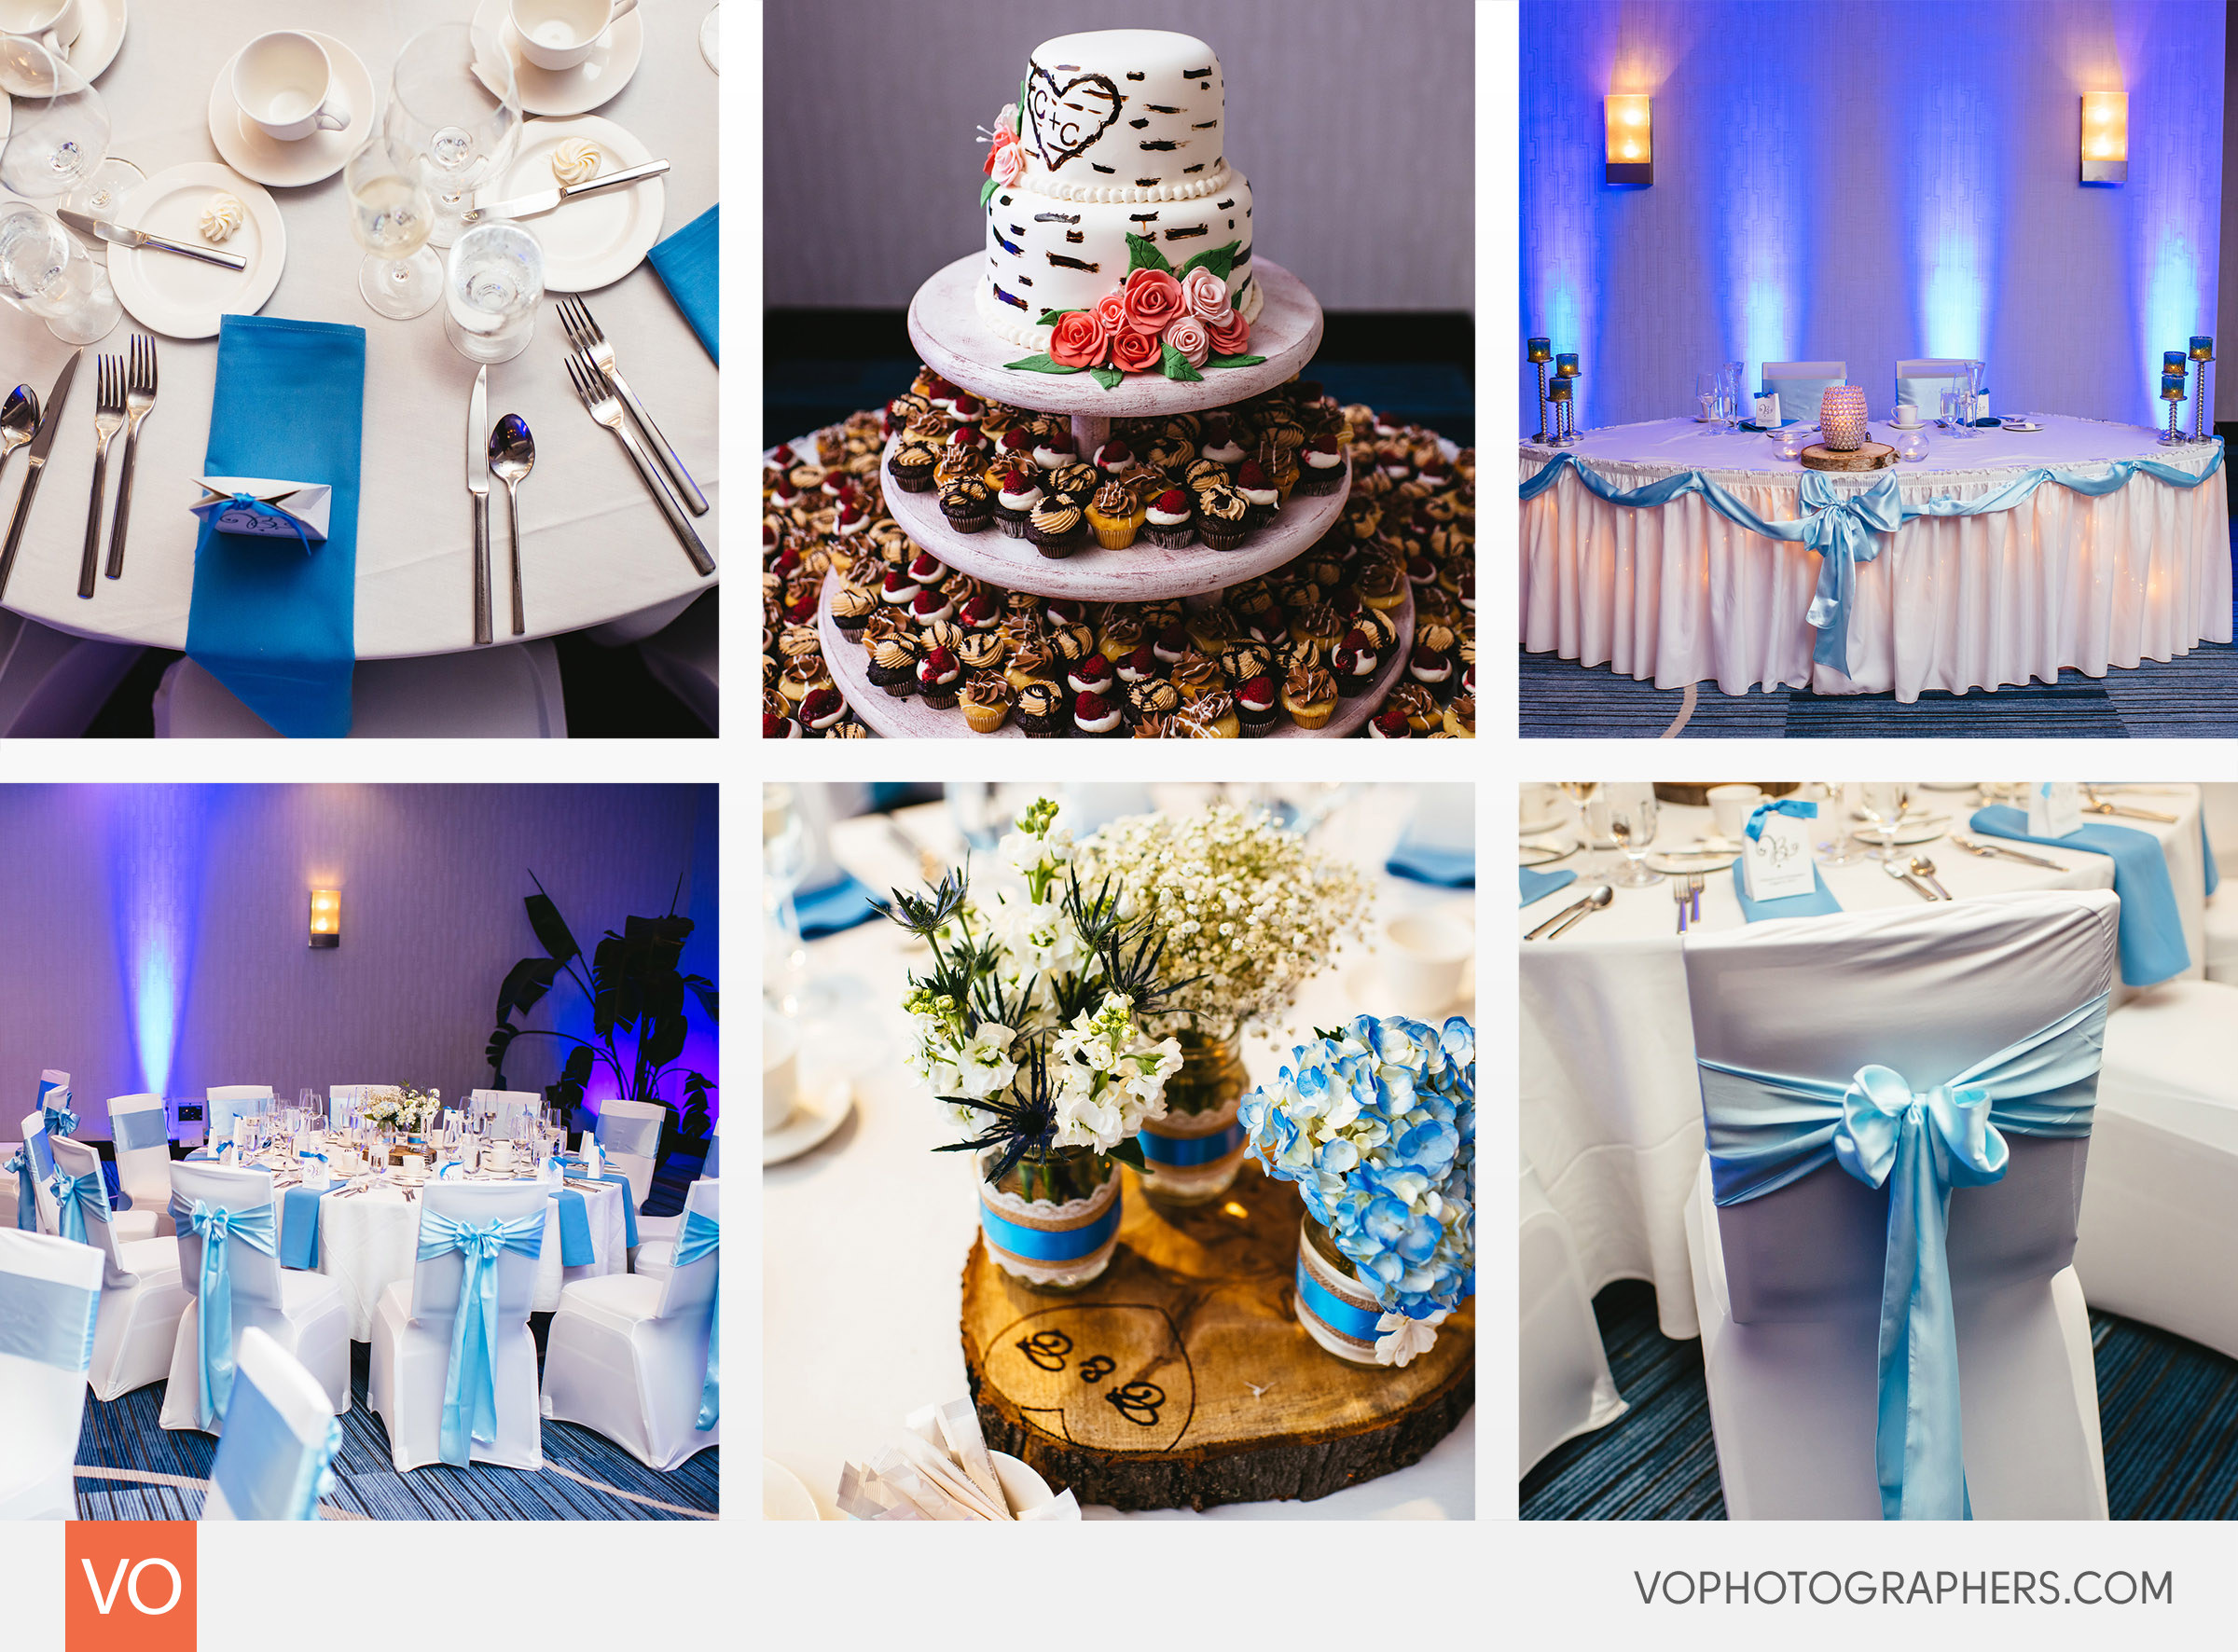 Doubletree-Hotel-Bristol-Wedding-Cathy-Chris-0030